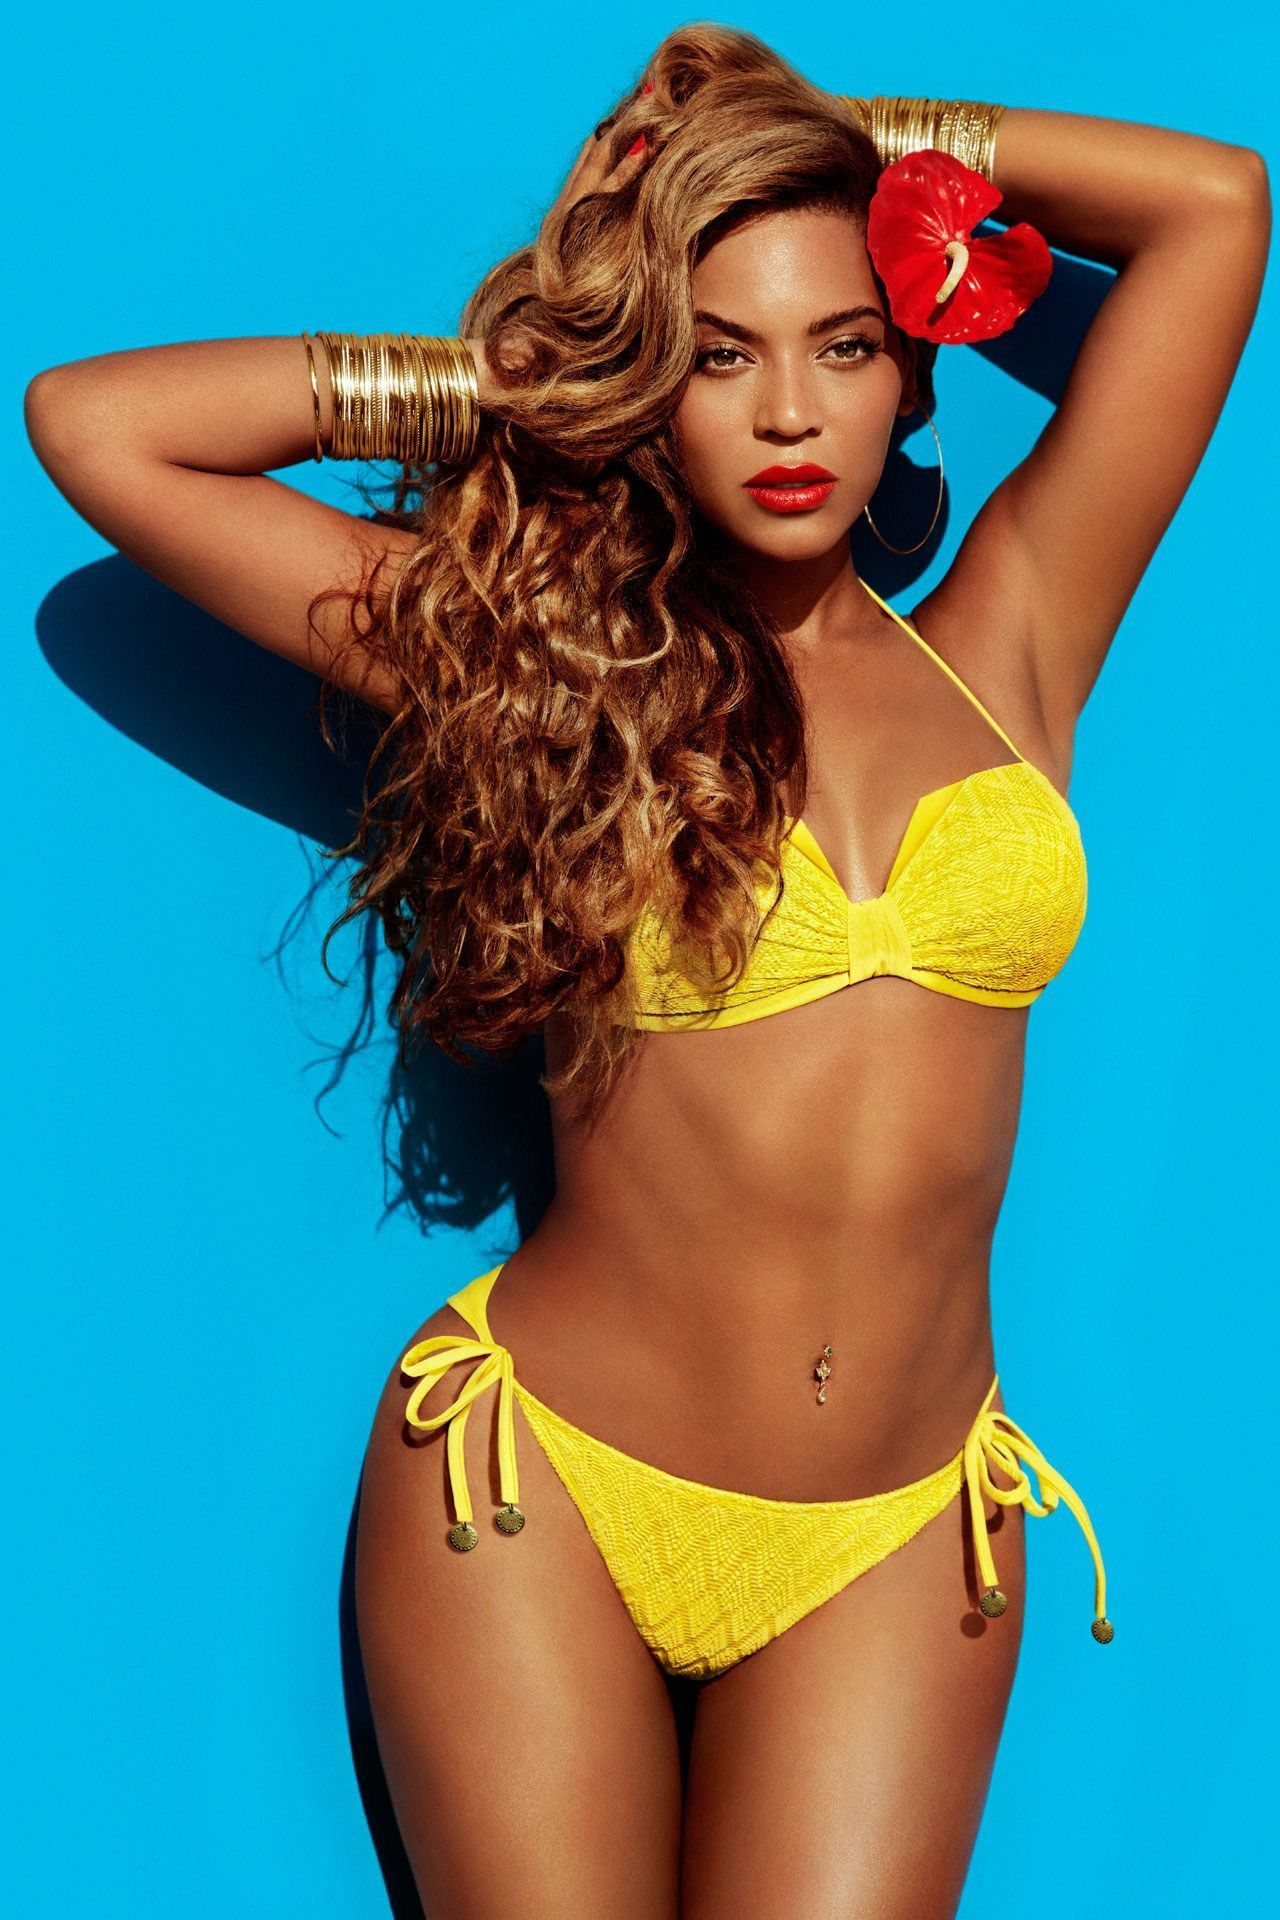 Knowles Beyonce Beyonce Knowles Beyonce Beyonce Knowles Knowles Ybf67Iygvm